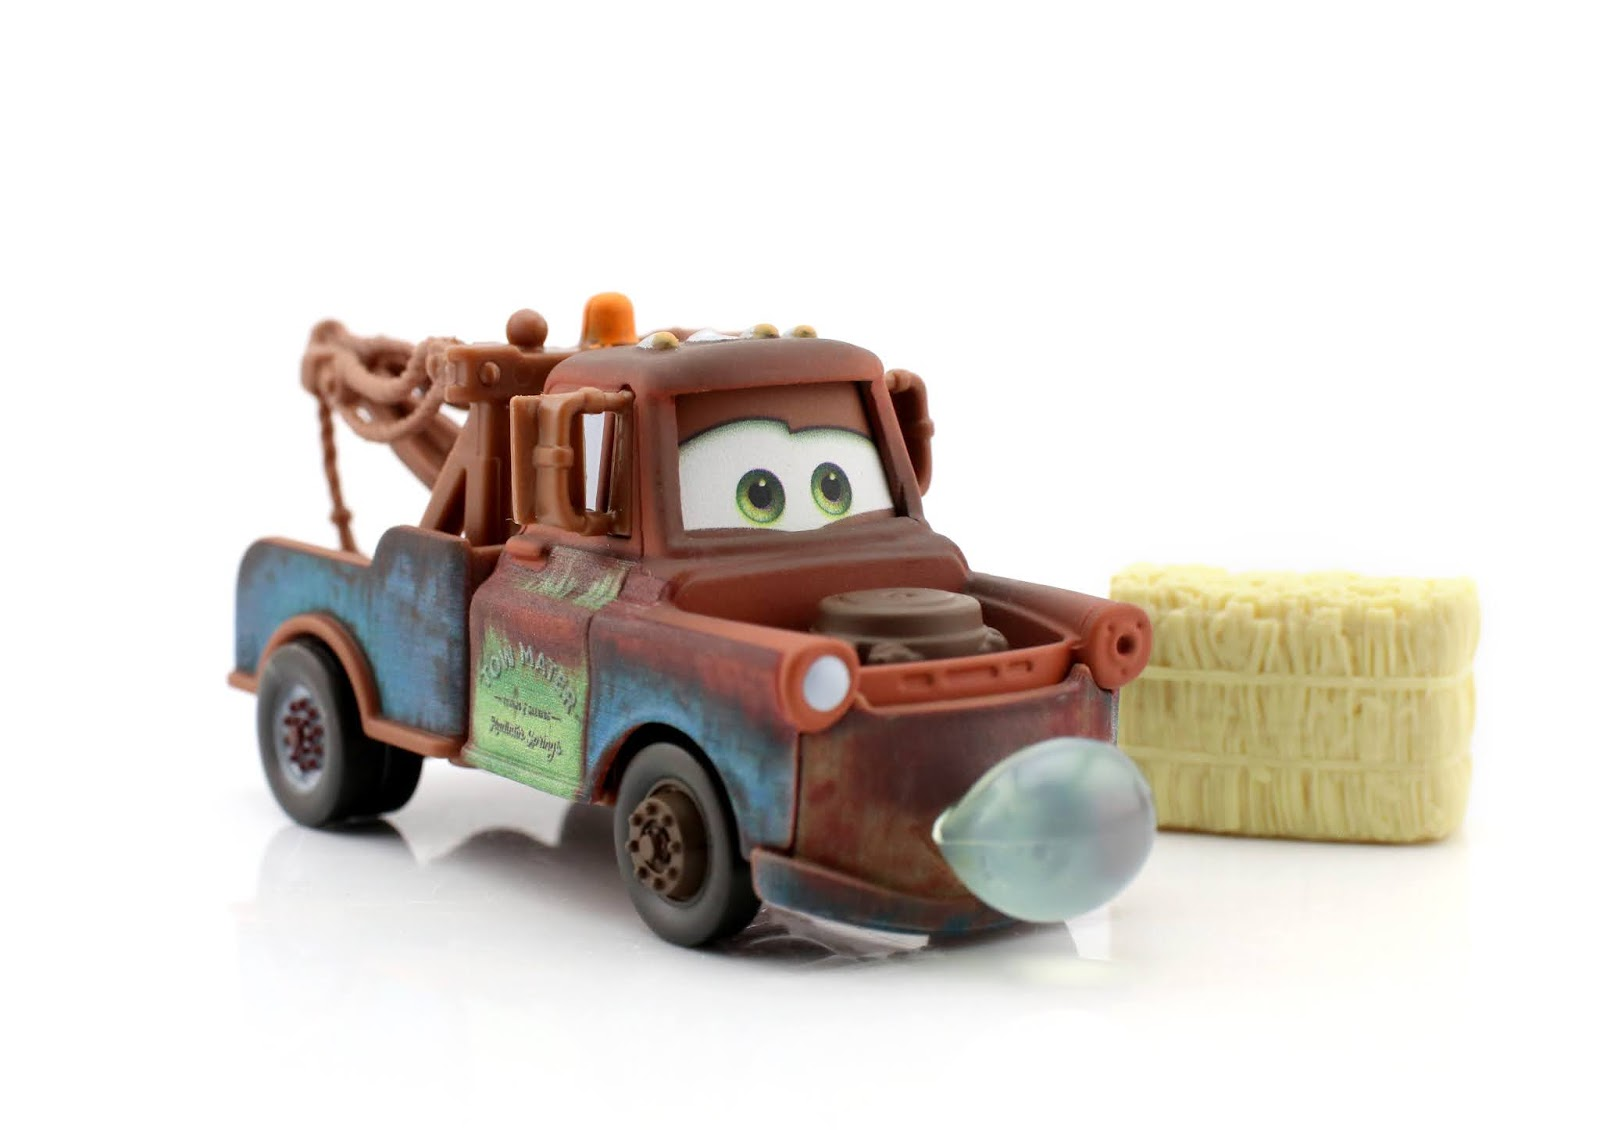 Pixar cars Blowing Bubbles Mater